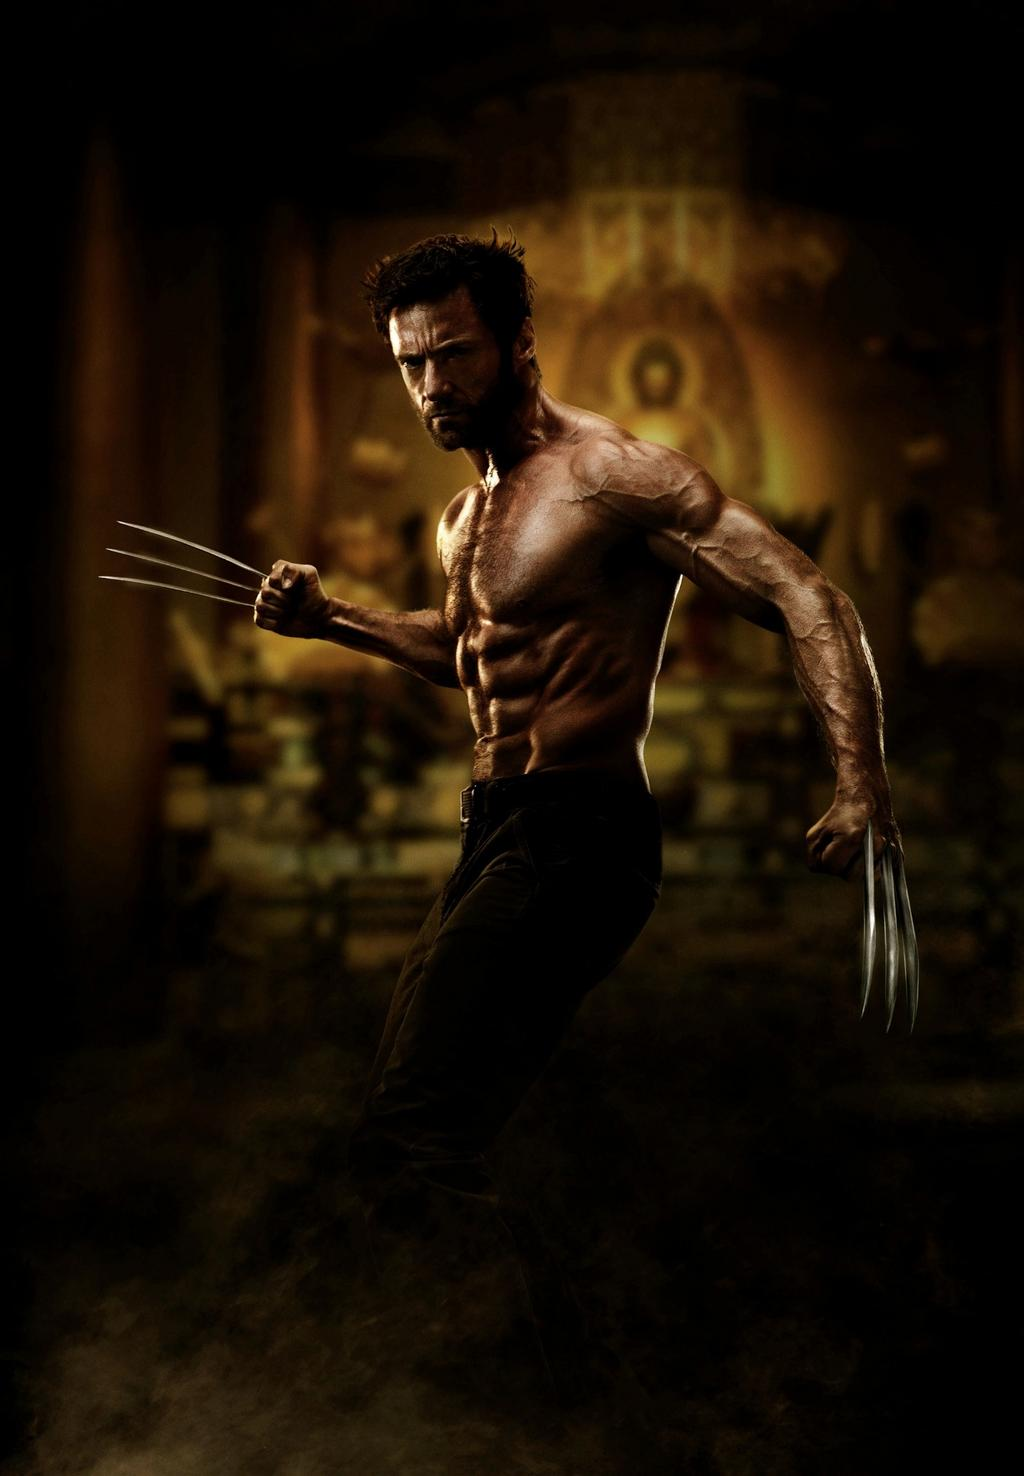 X Men Wolverine Iphone Wallpapers Top Free X Men Wolverine